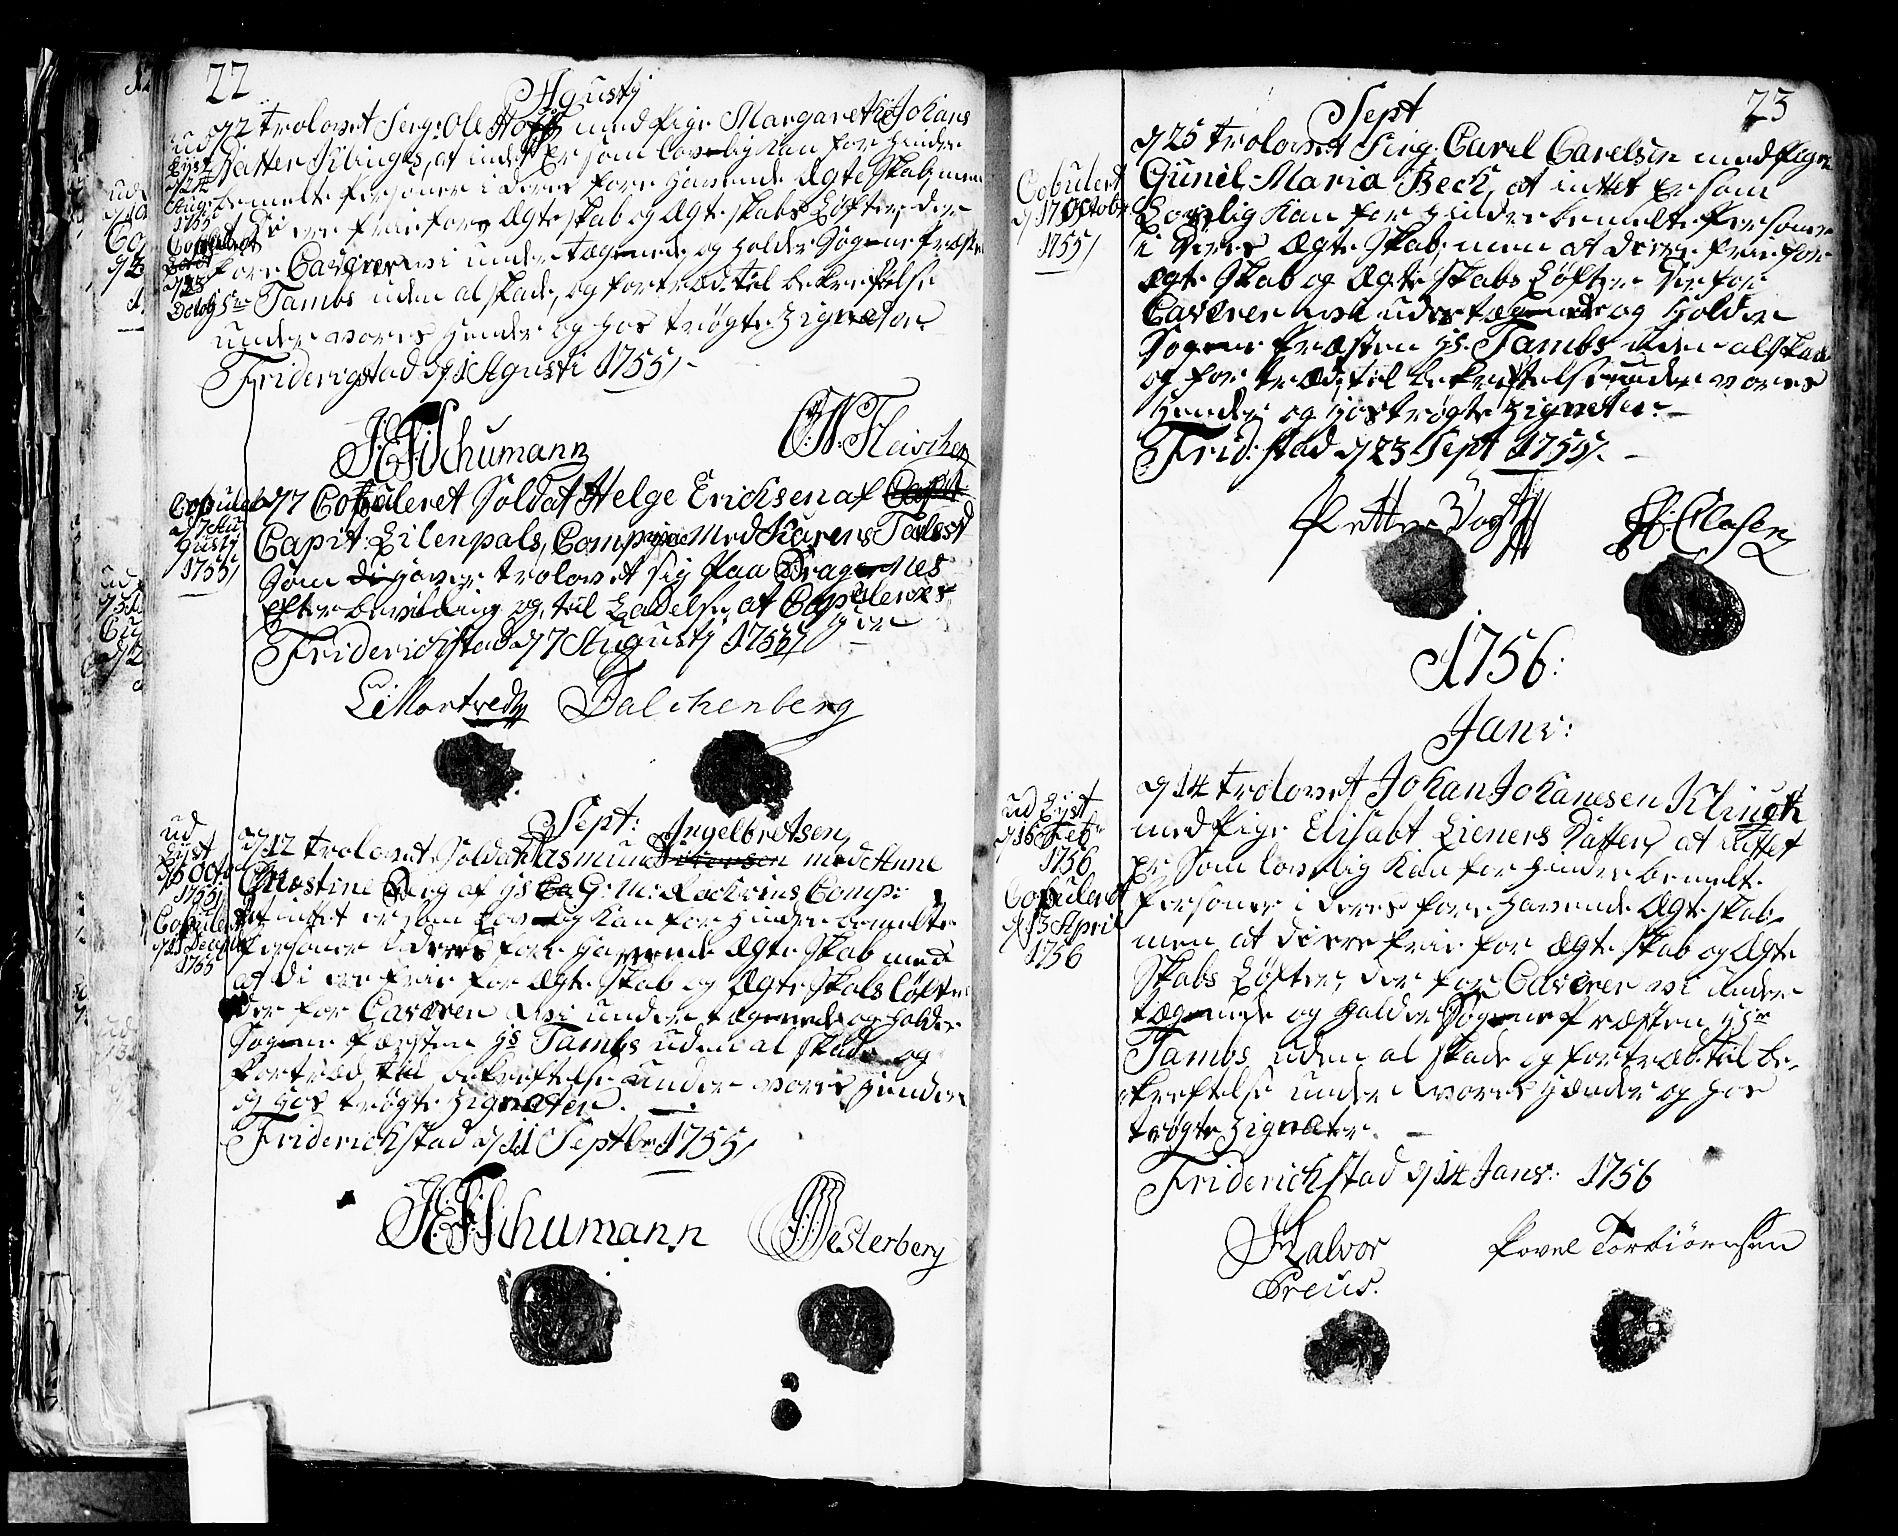 SAO, Fredrikstad prestekontor Kirkebøker, F/Fa/L0002: Ministerialbok nr. 2, 1750-1804, s. 22-23